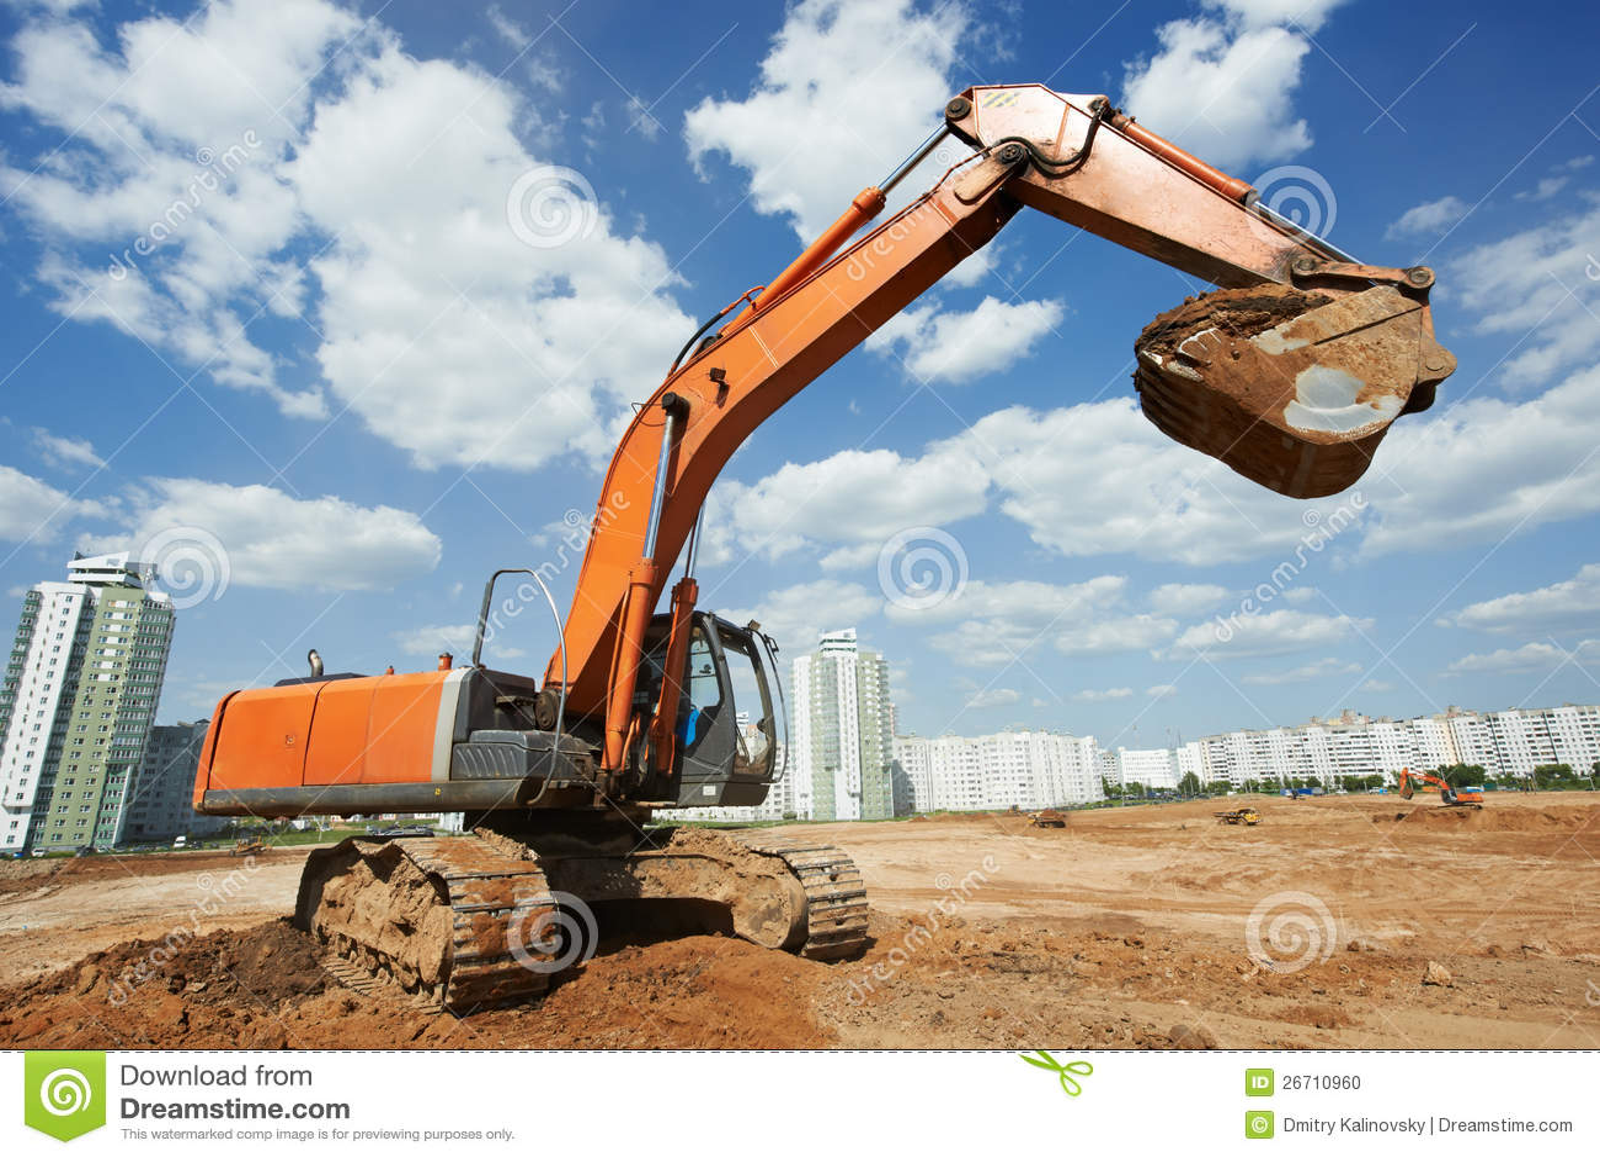 Track Type Loader Bulldozer Excavator At Work Royalty Free